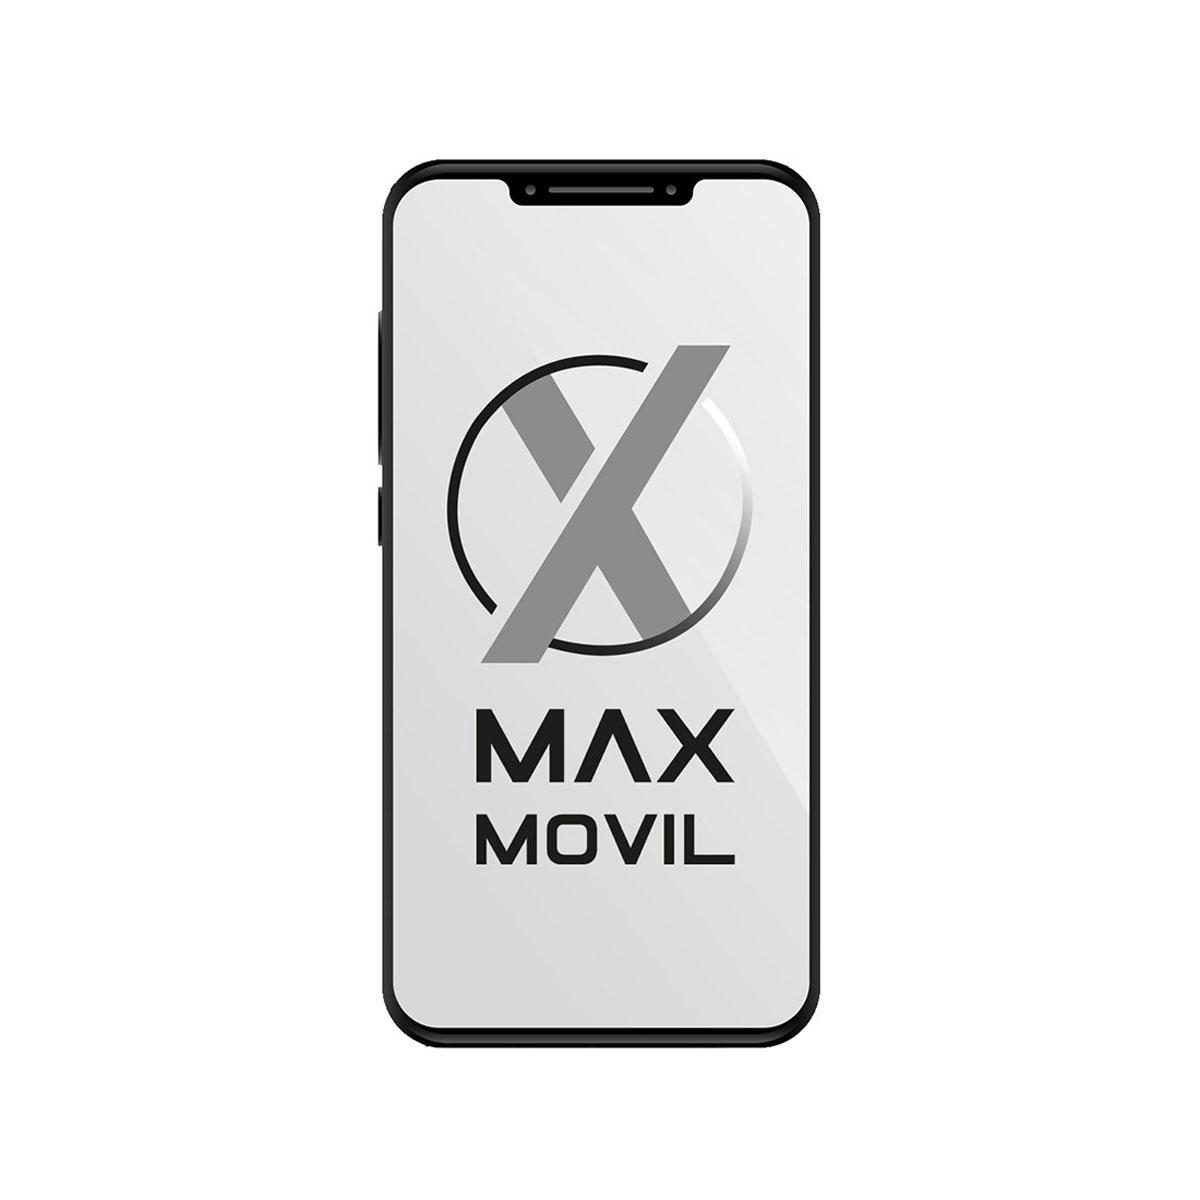 Samsung Galaxy J3 (2016) gold DualSIM libre en MAXmovil